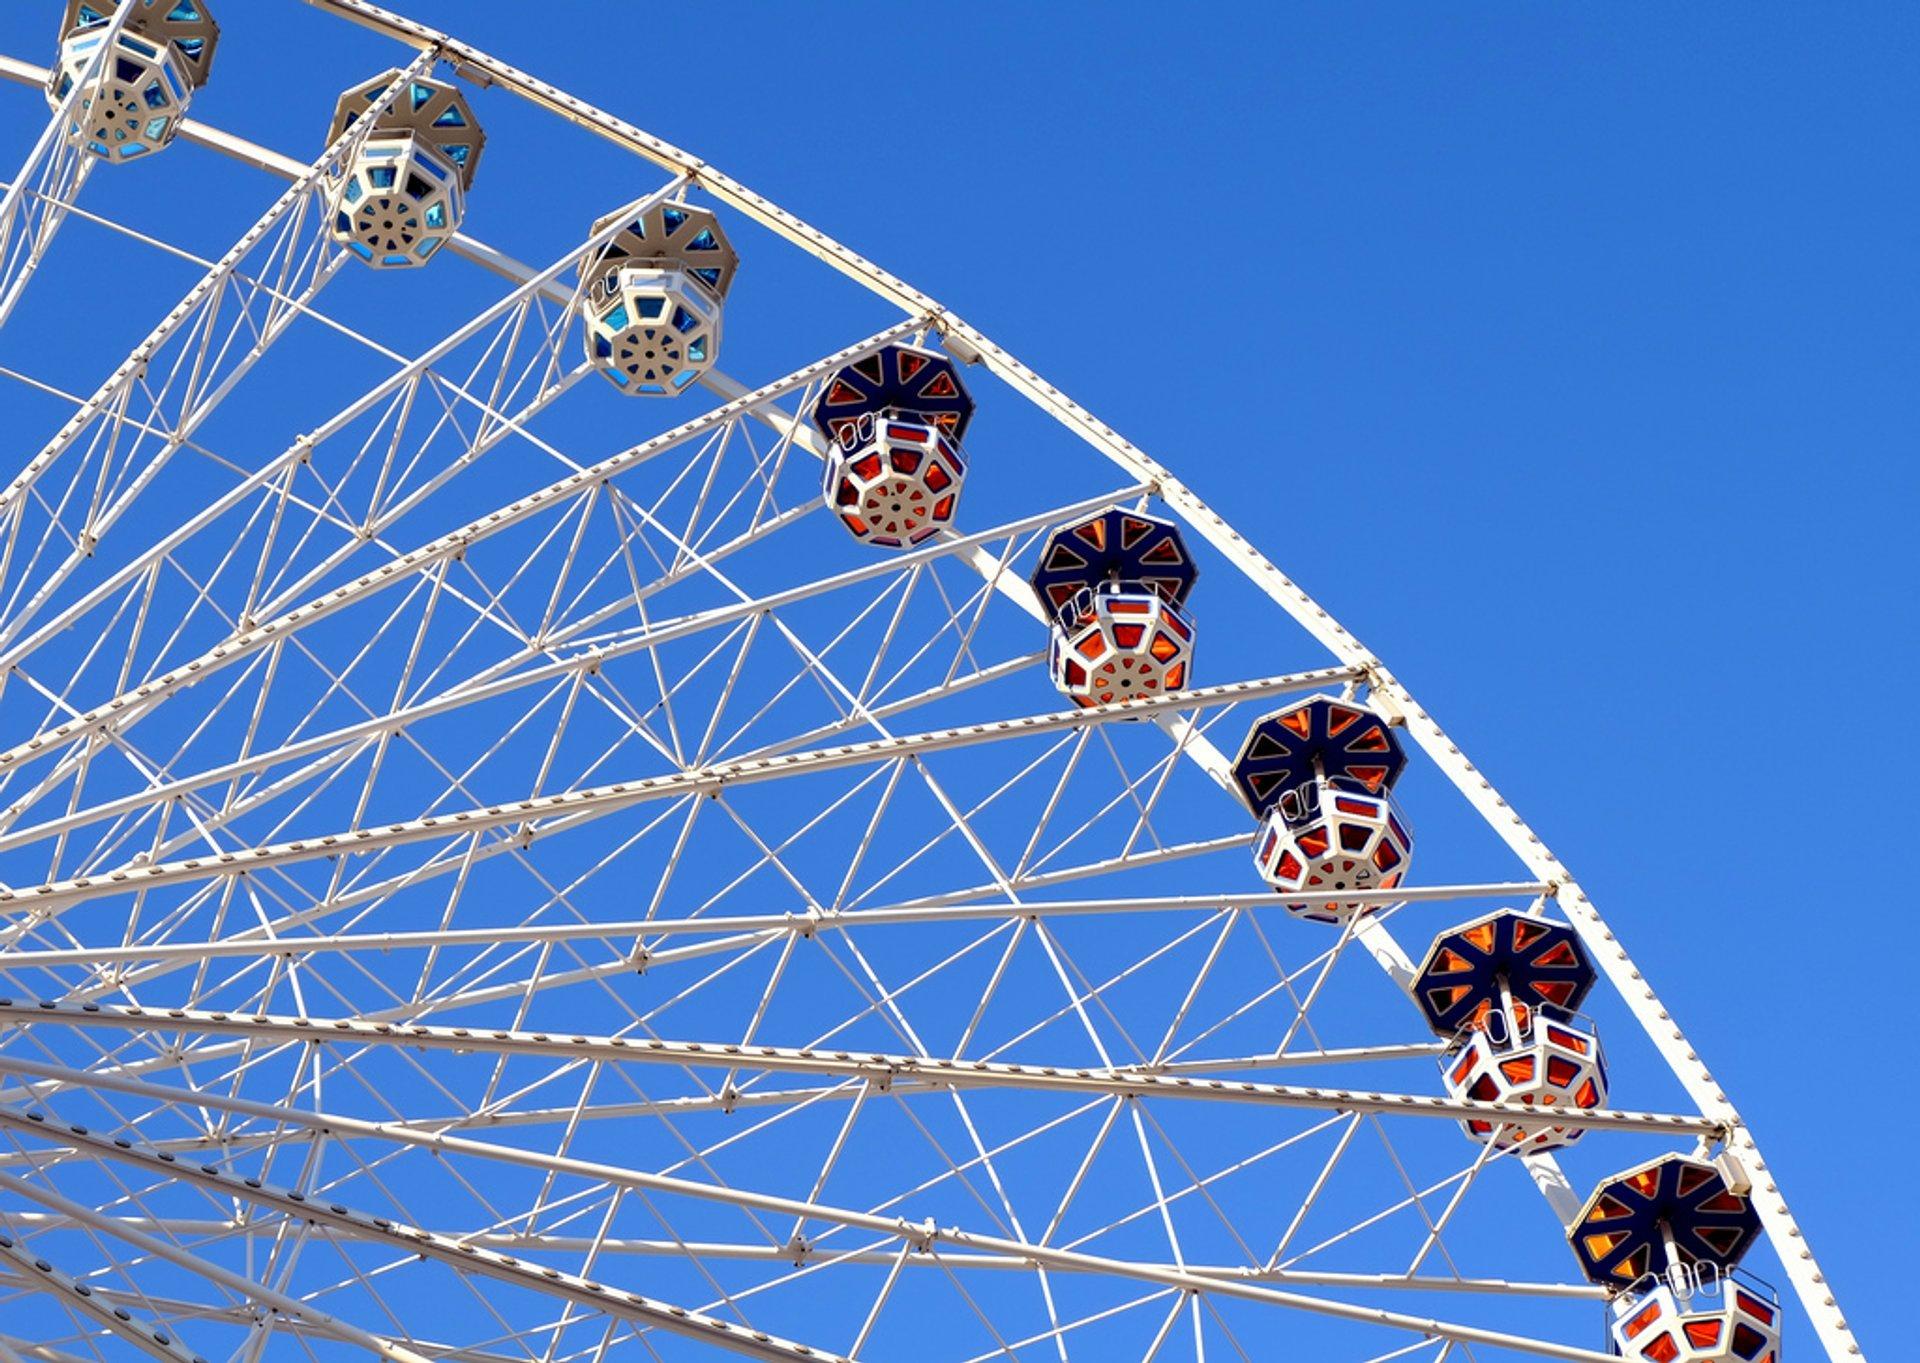 Wiener Riesenrad (Ferris Wheel) 2019